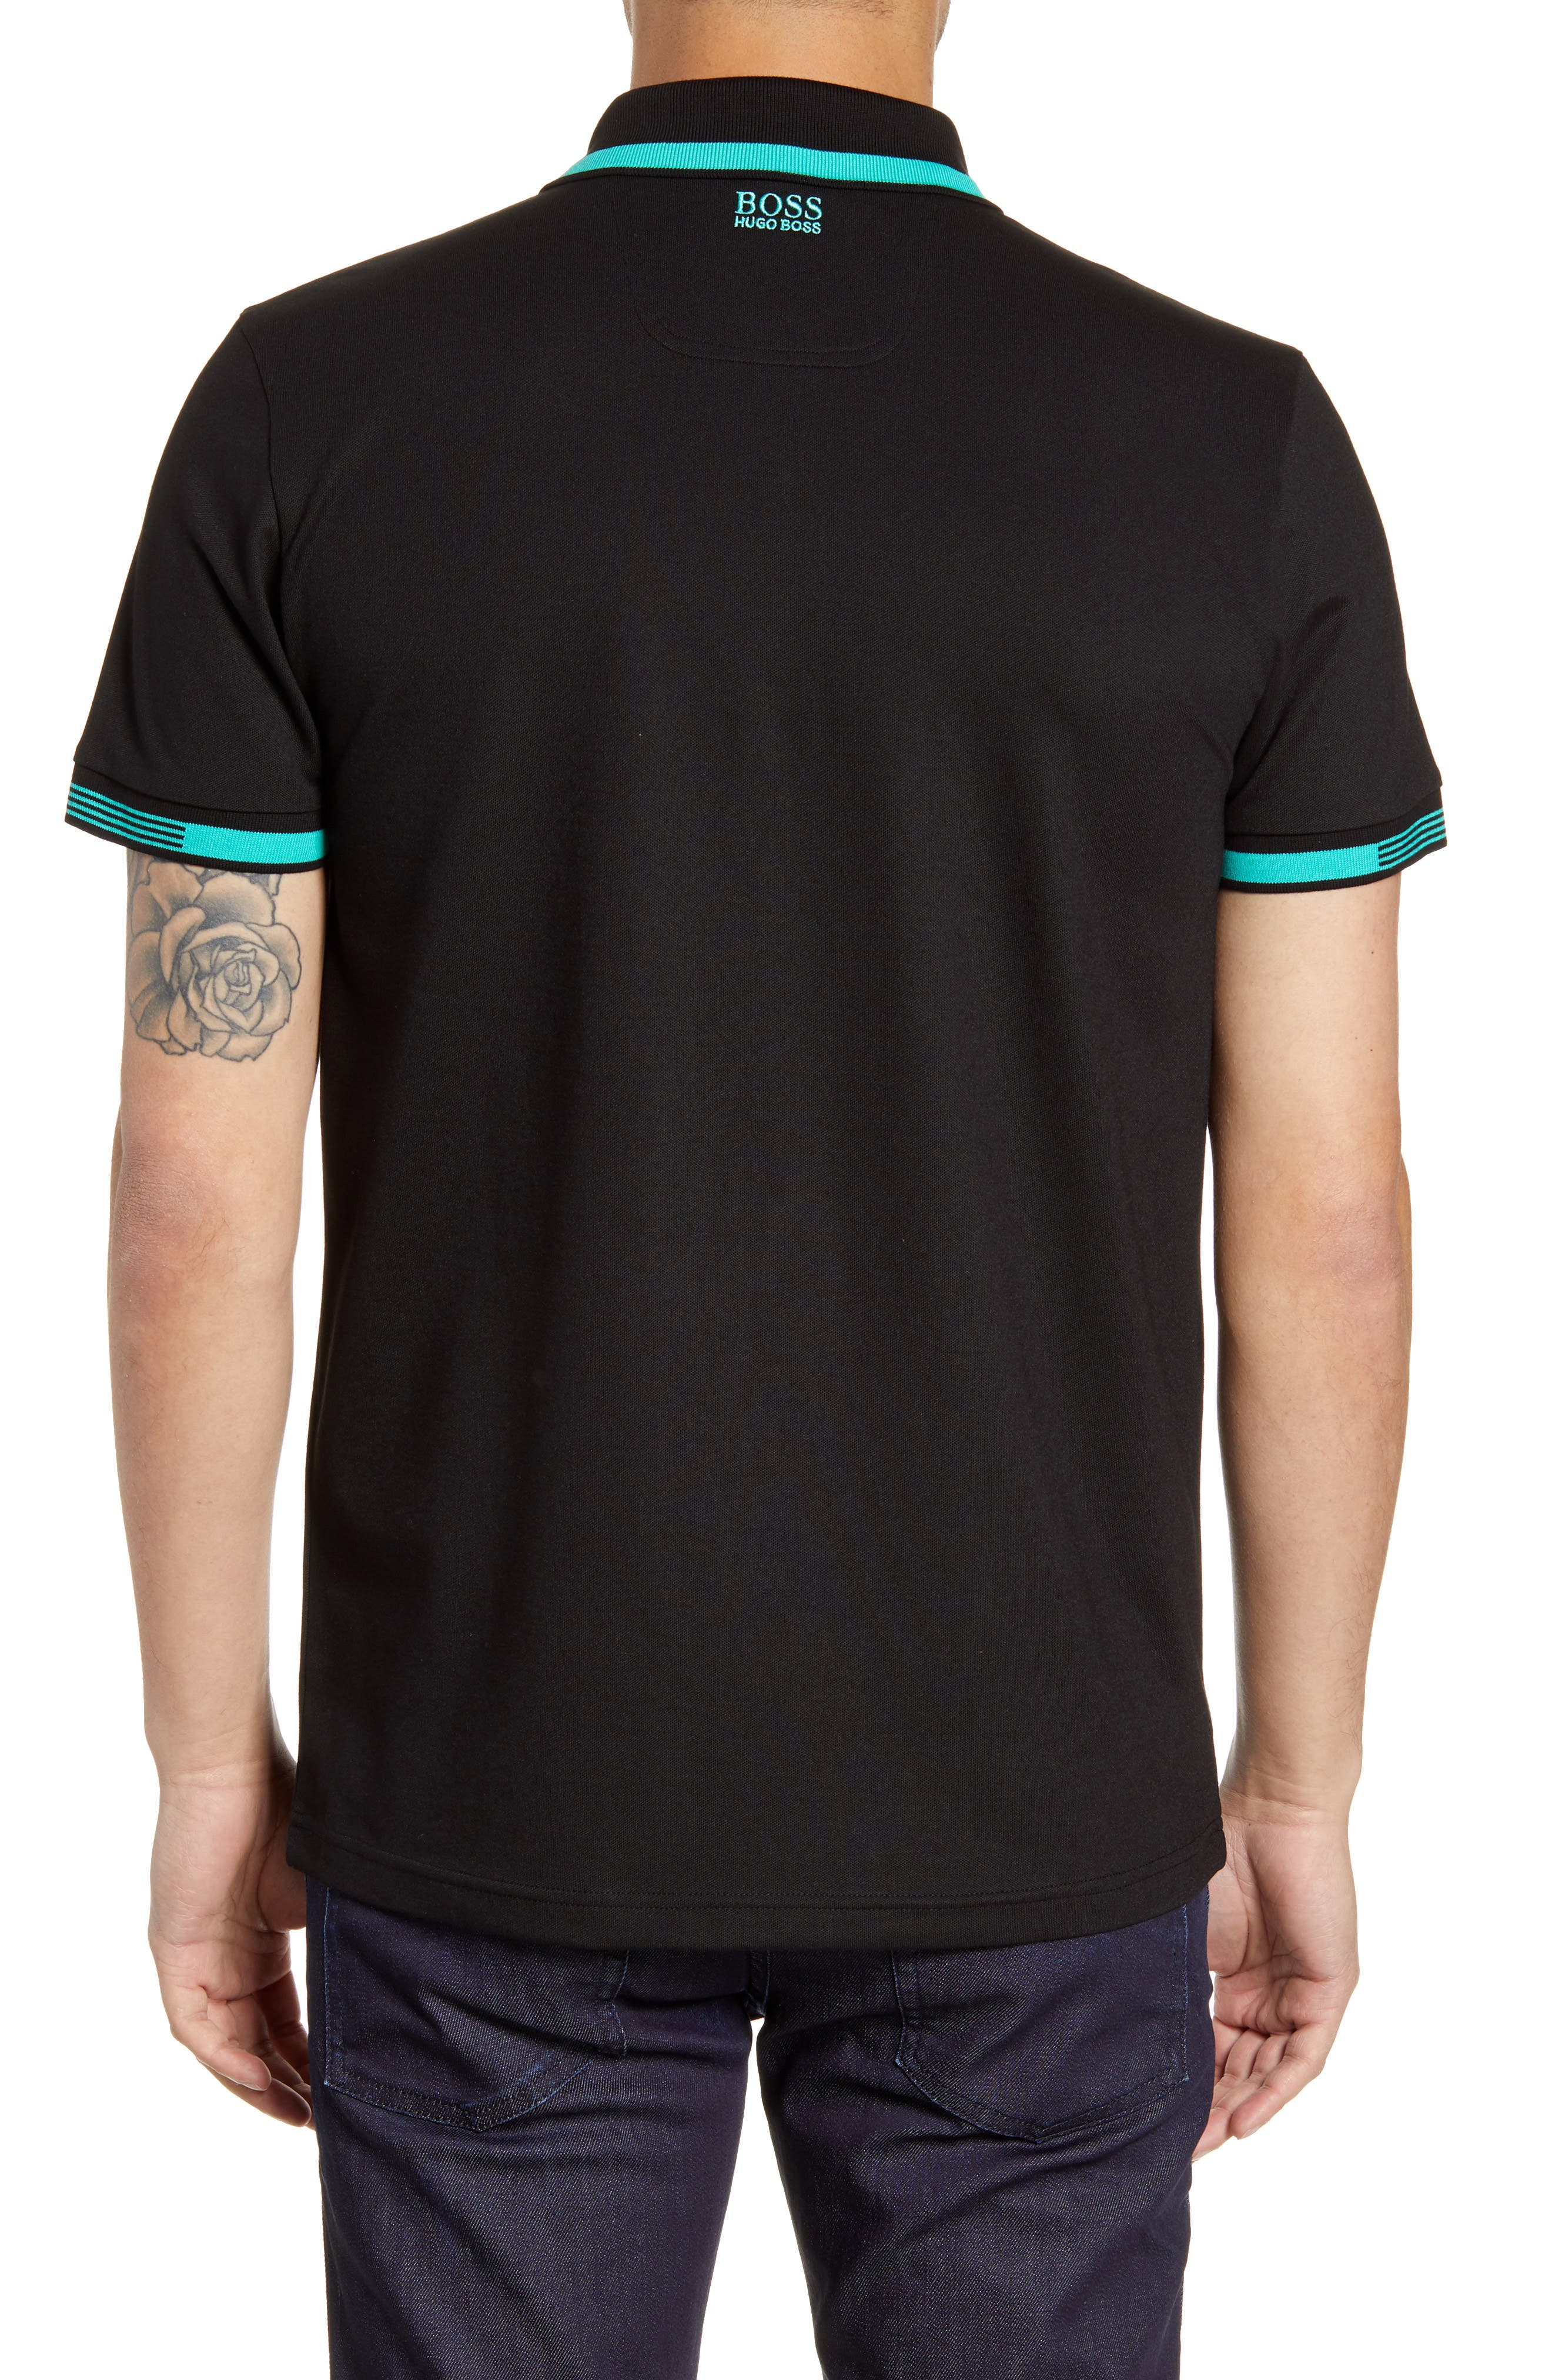 23333bb67 Men's BOSS Polo Shirts | Nordstrom